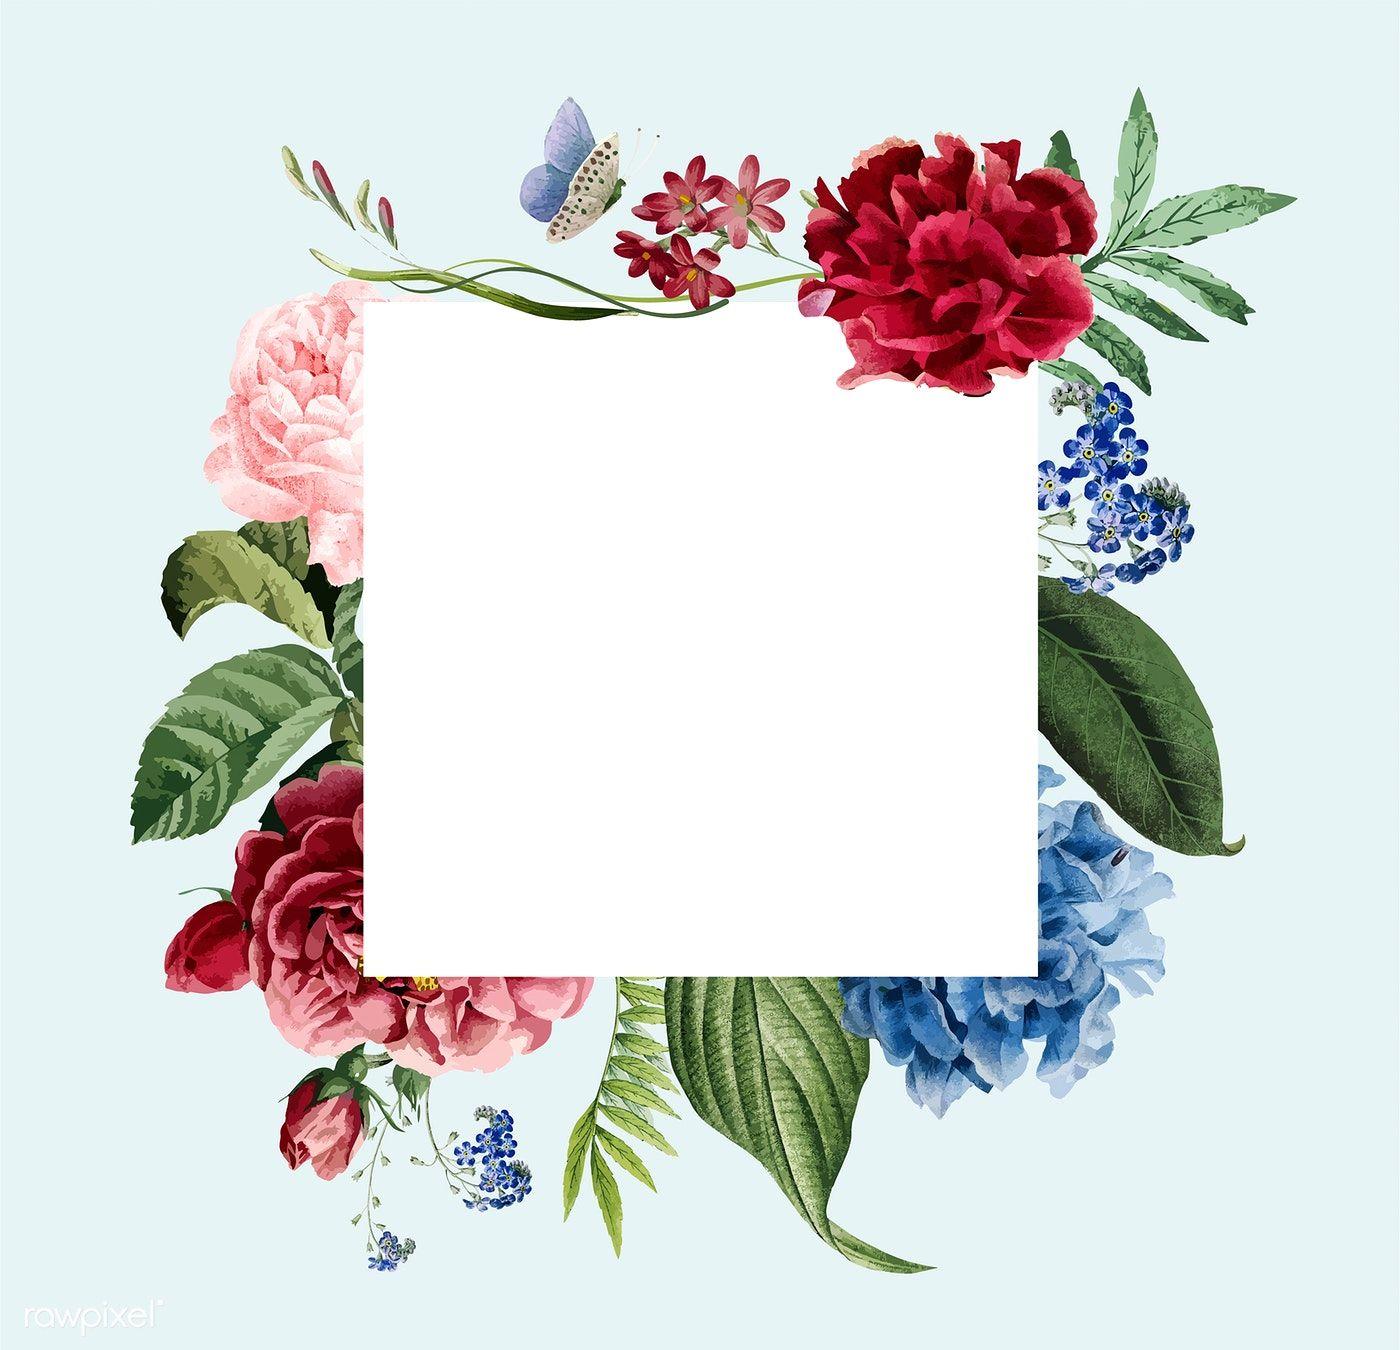 Download premium vector of Floral frame invitation card